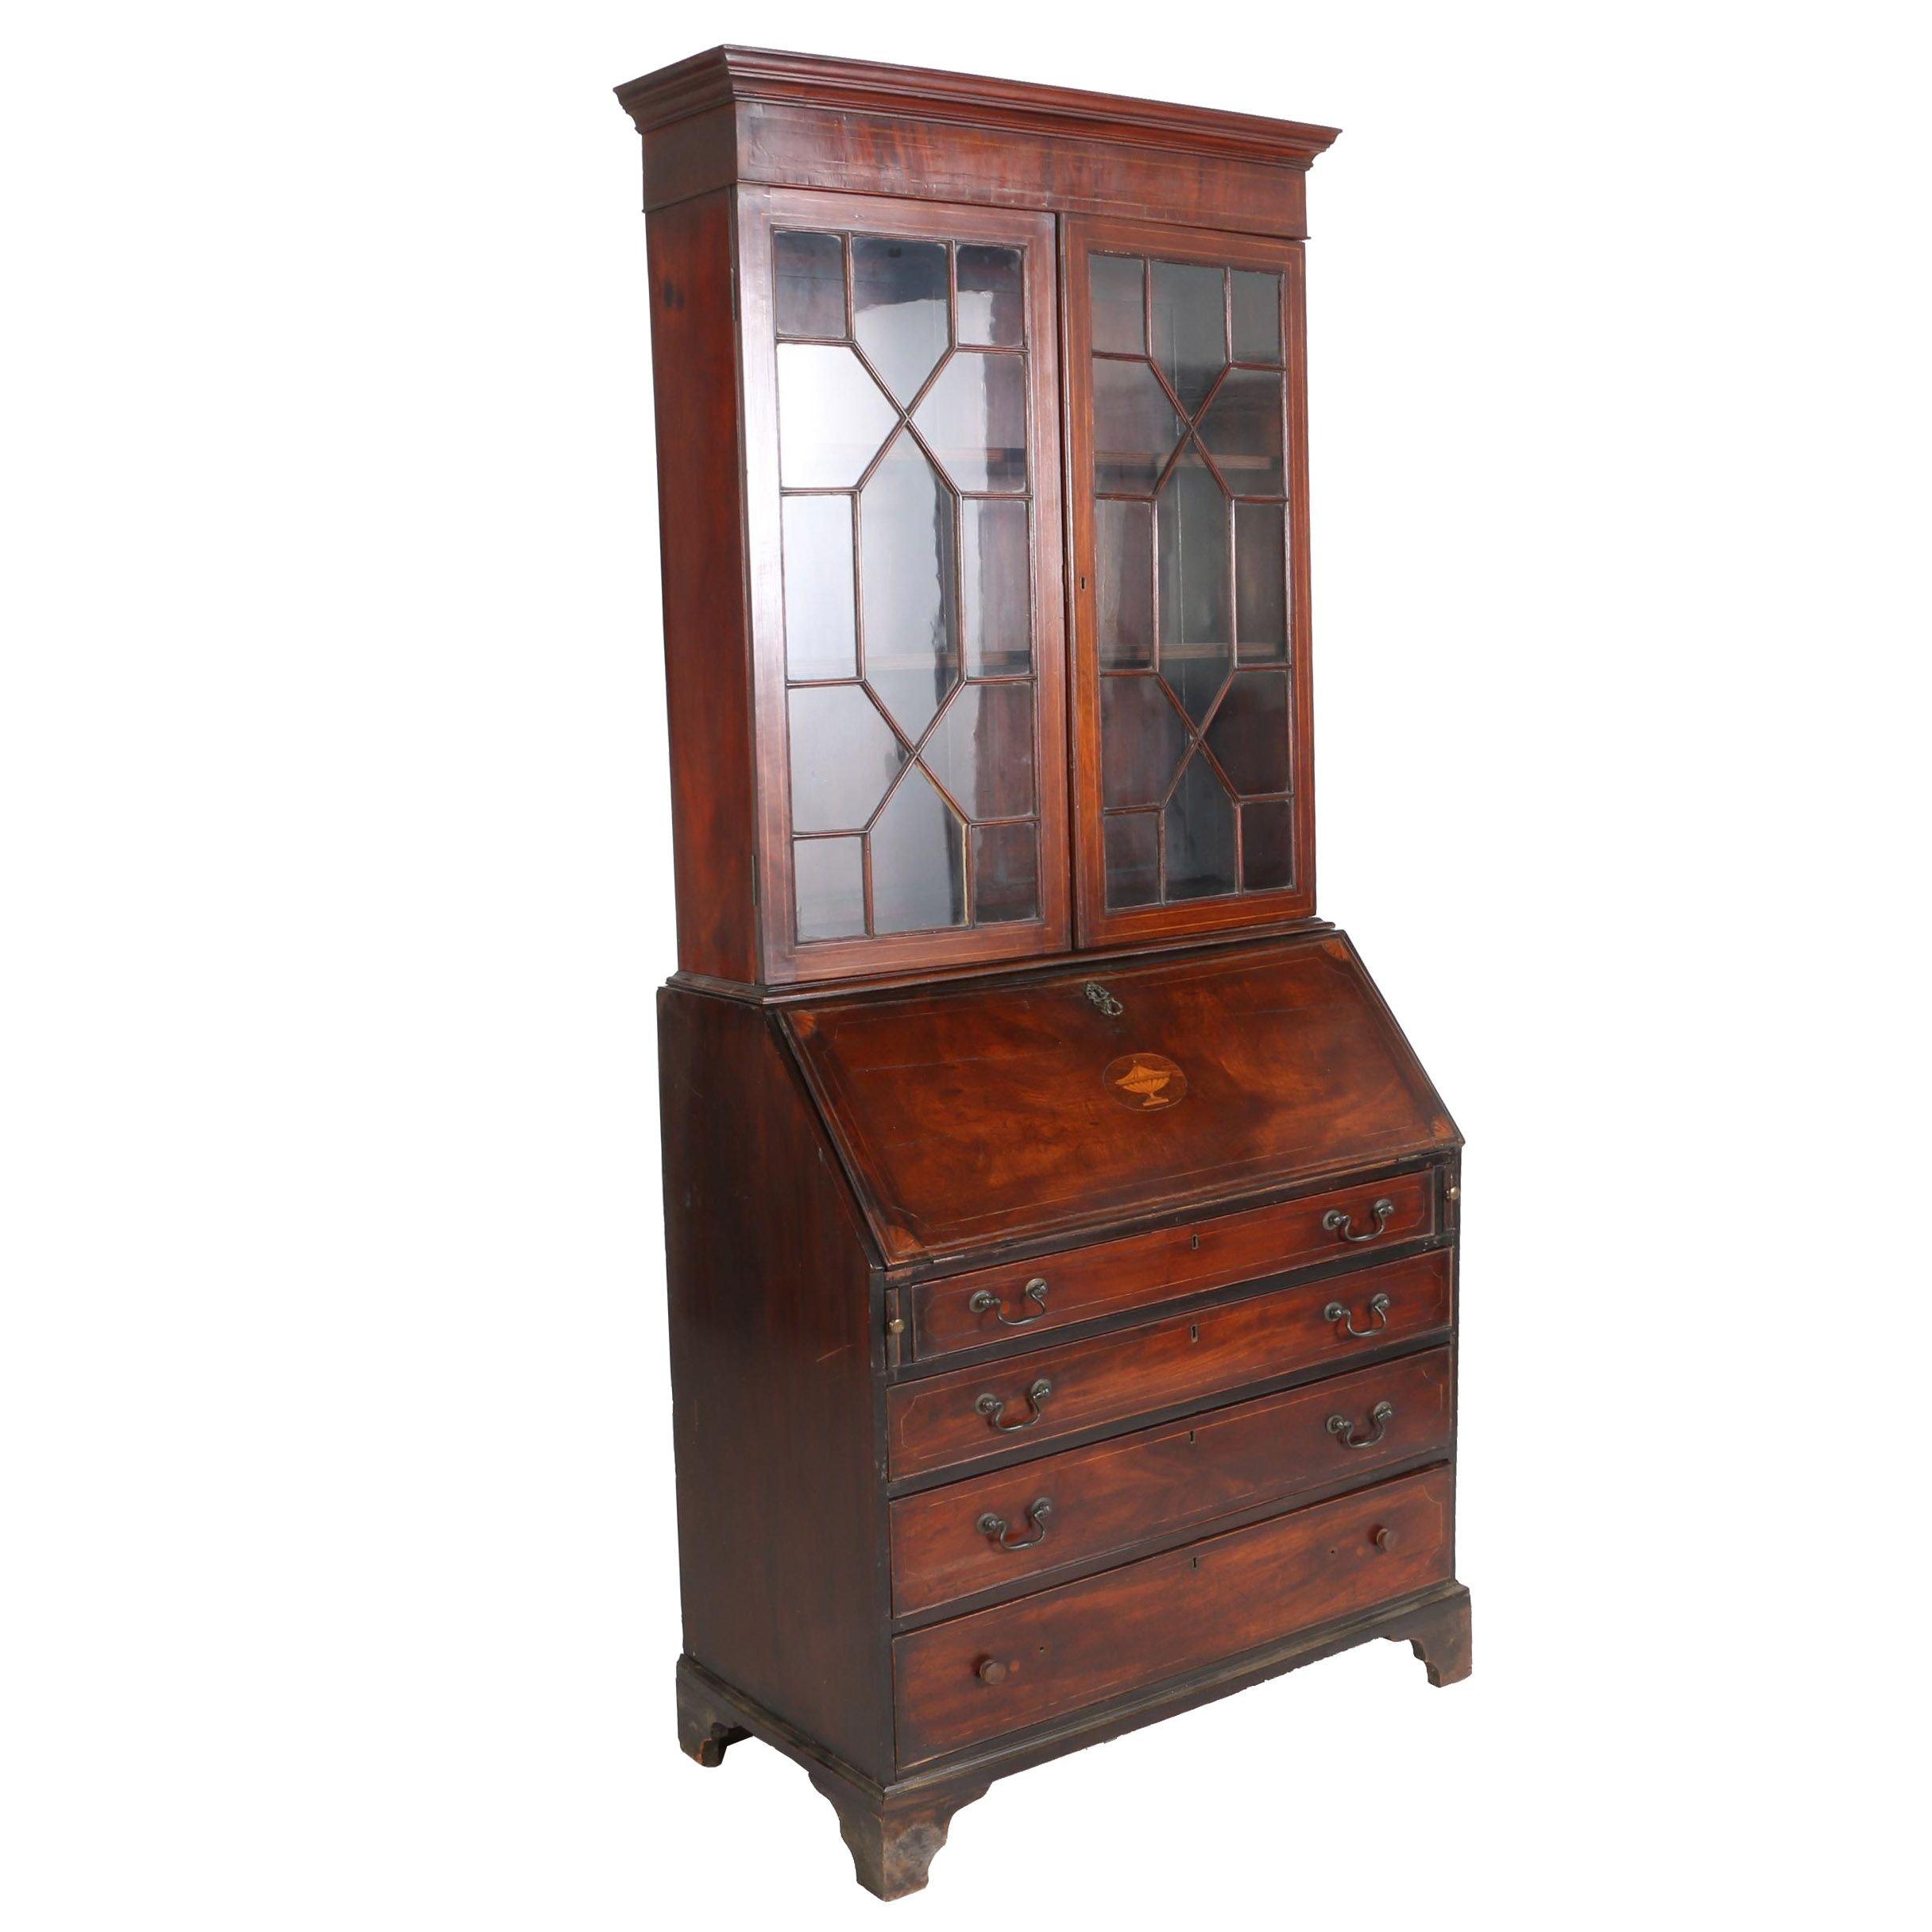 George III Mahogany and Marquetry Bureau Bookcase, Circa 1800